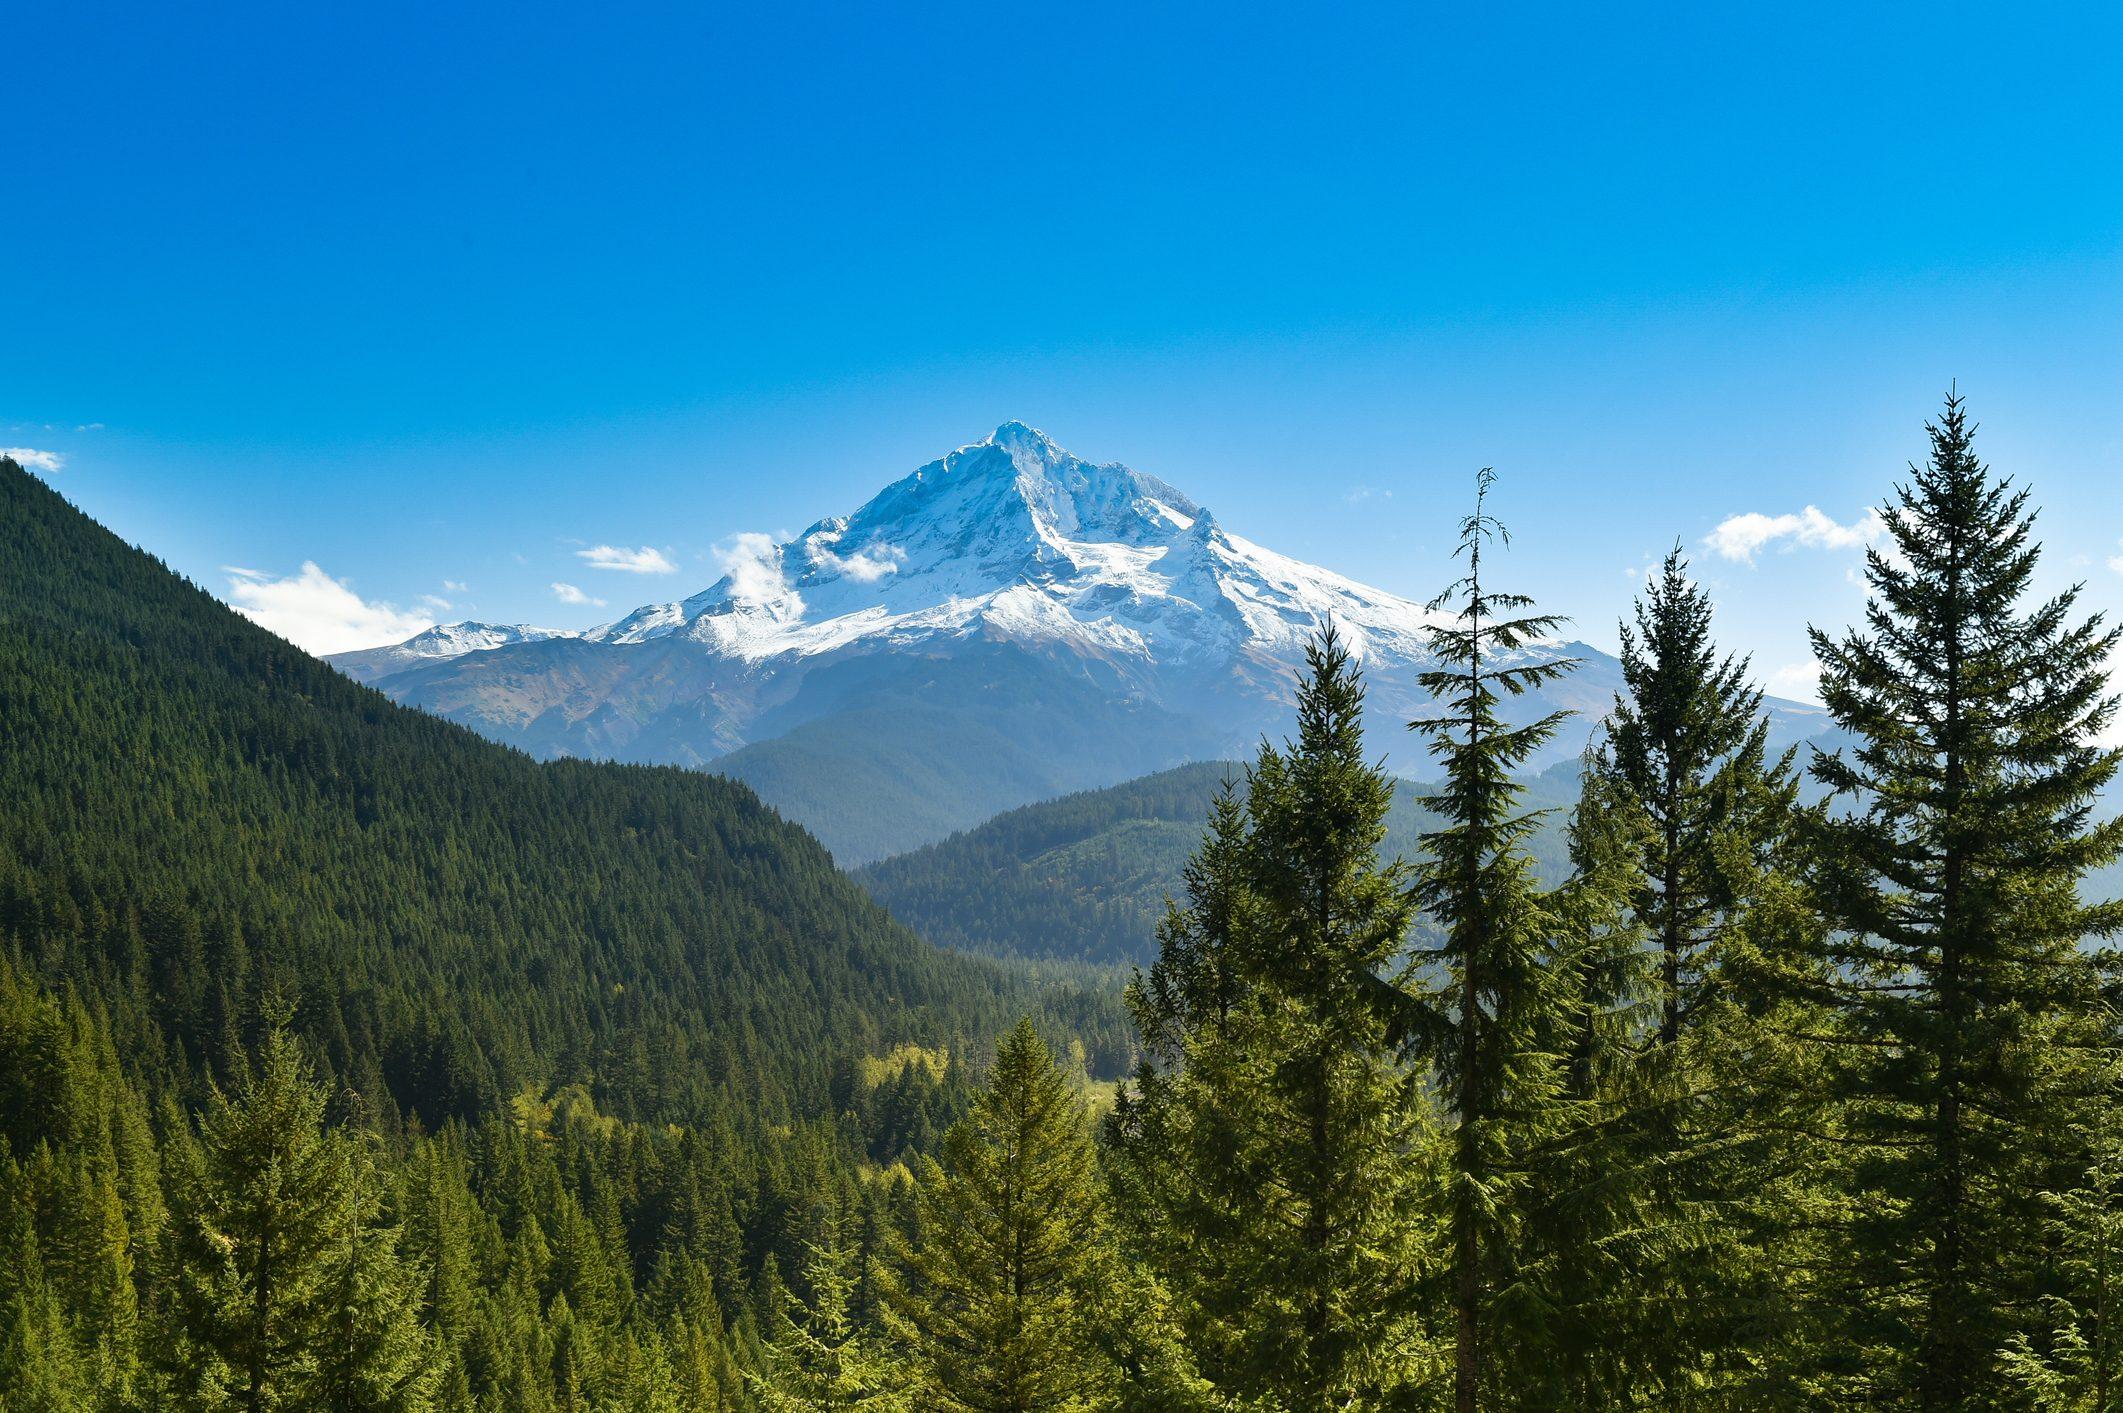 Mount Hood with pine trees